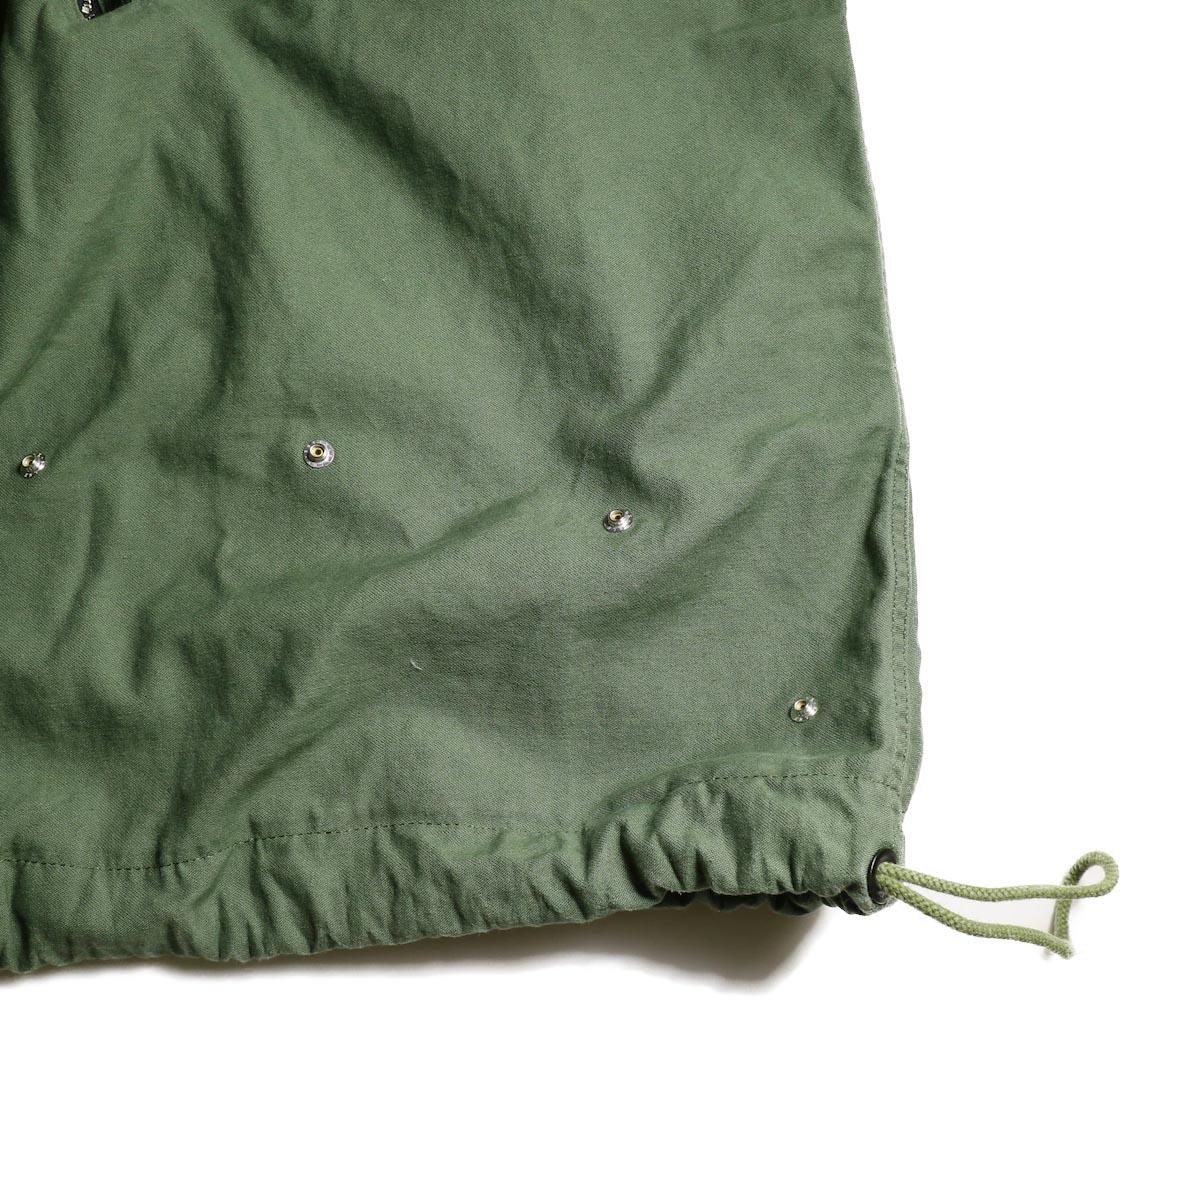 OLD PARK / LAUNDRY VEST BAG -Military 裾、スナップボタン